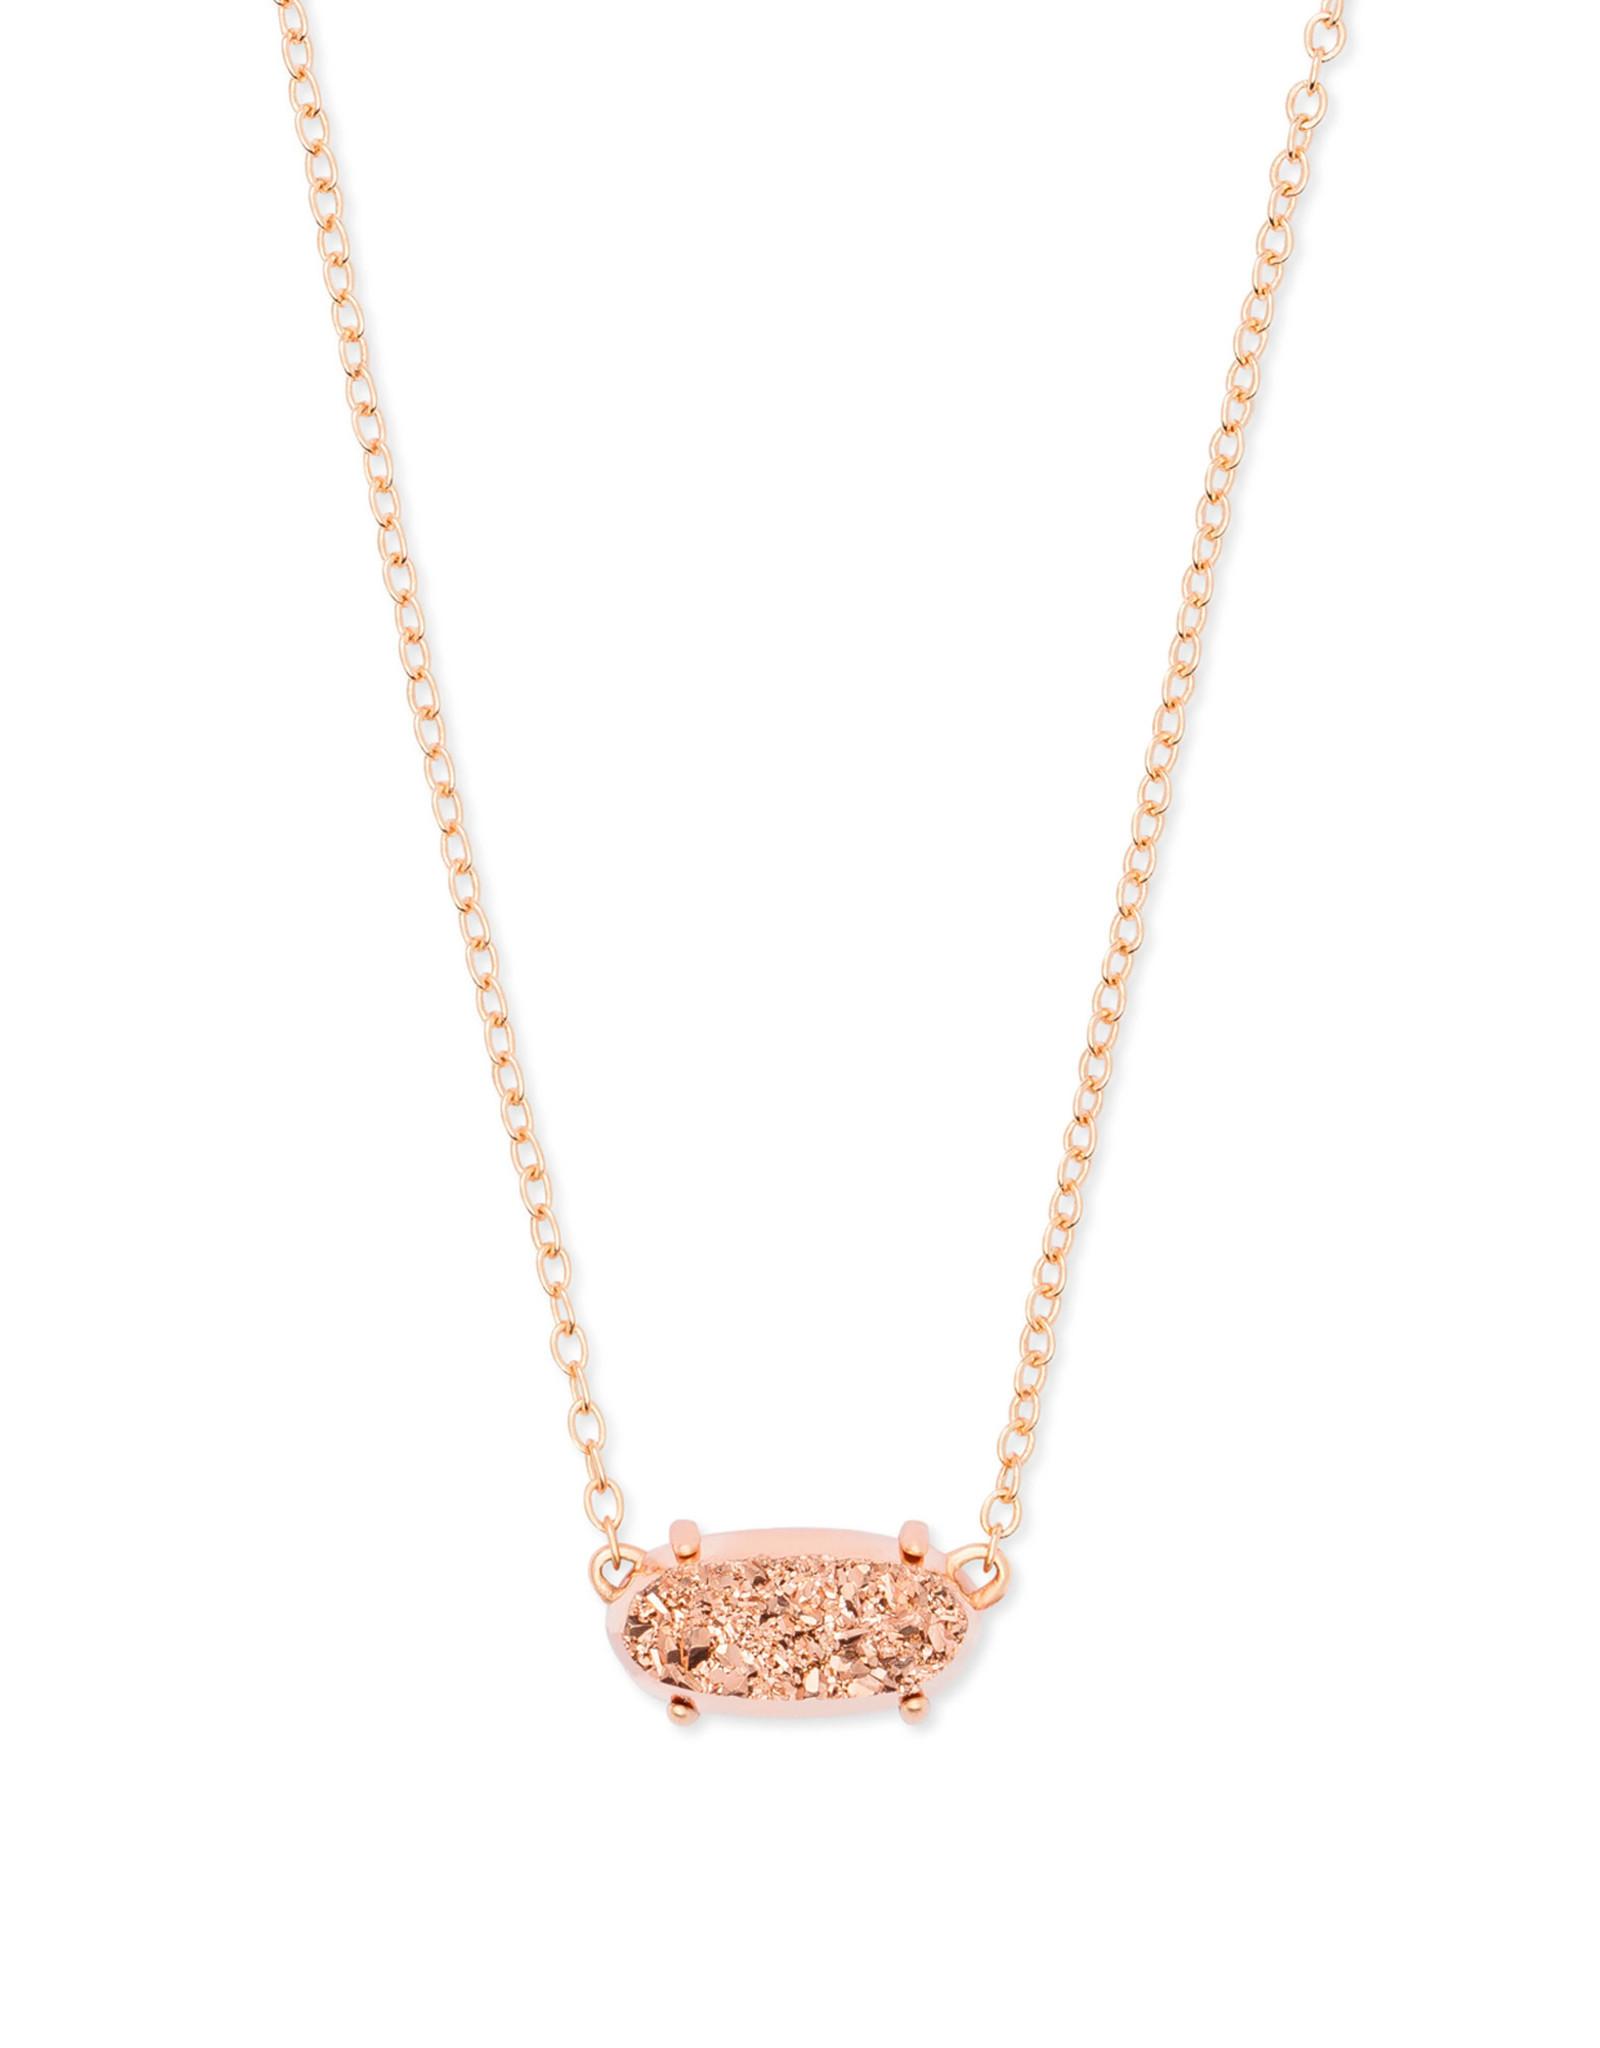 Kendra Scott Ever Necklace - Rose Gold Drusy/Rose Gold